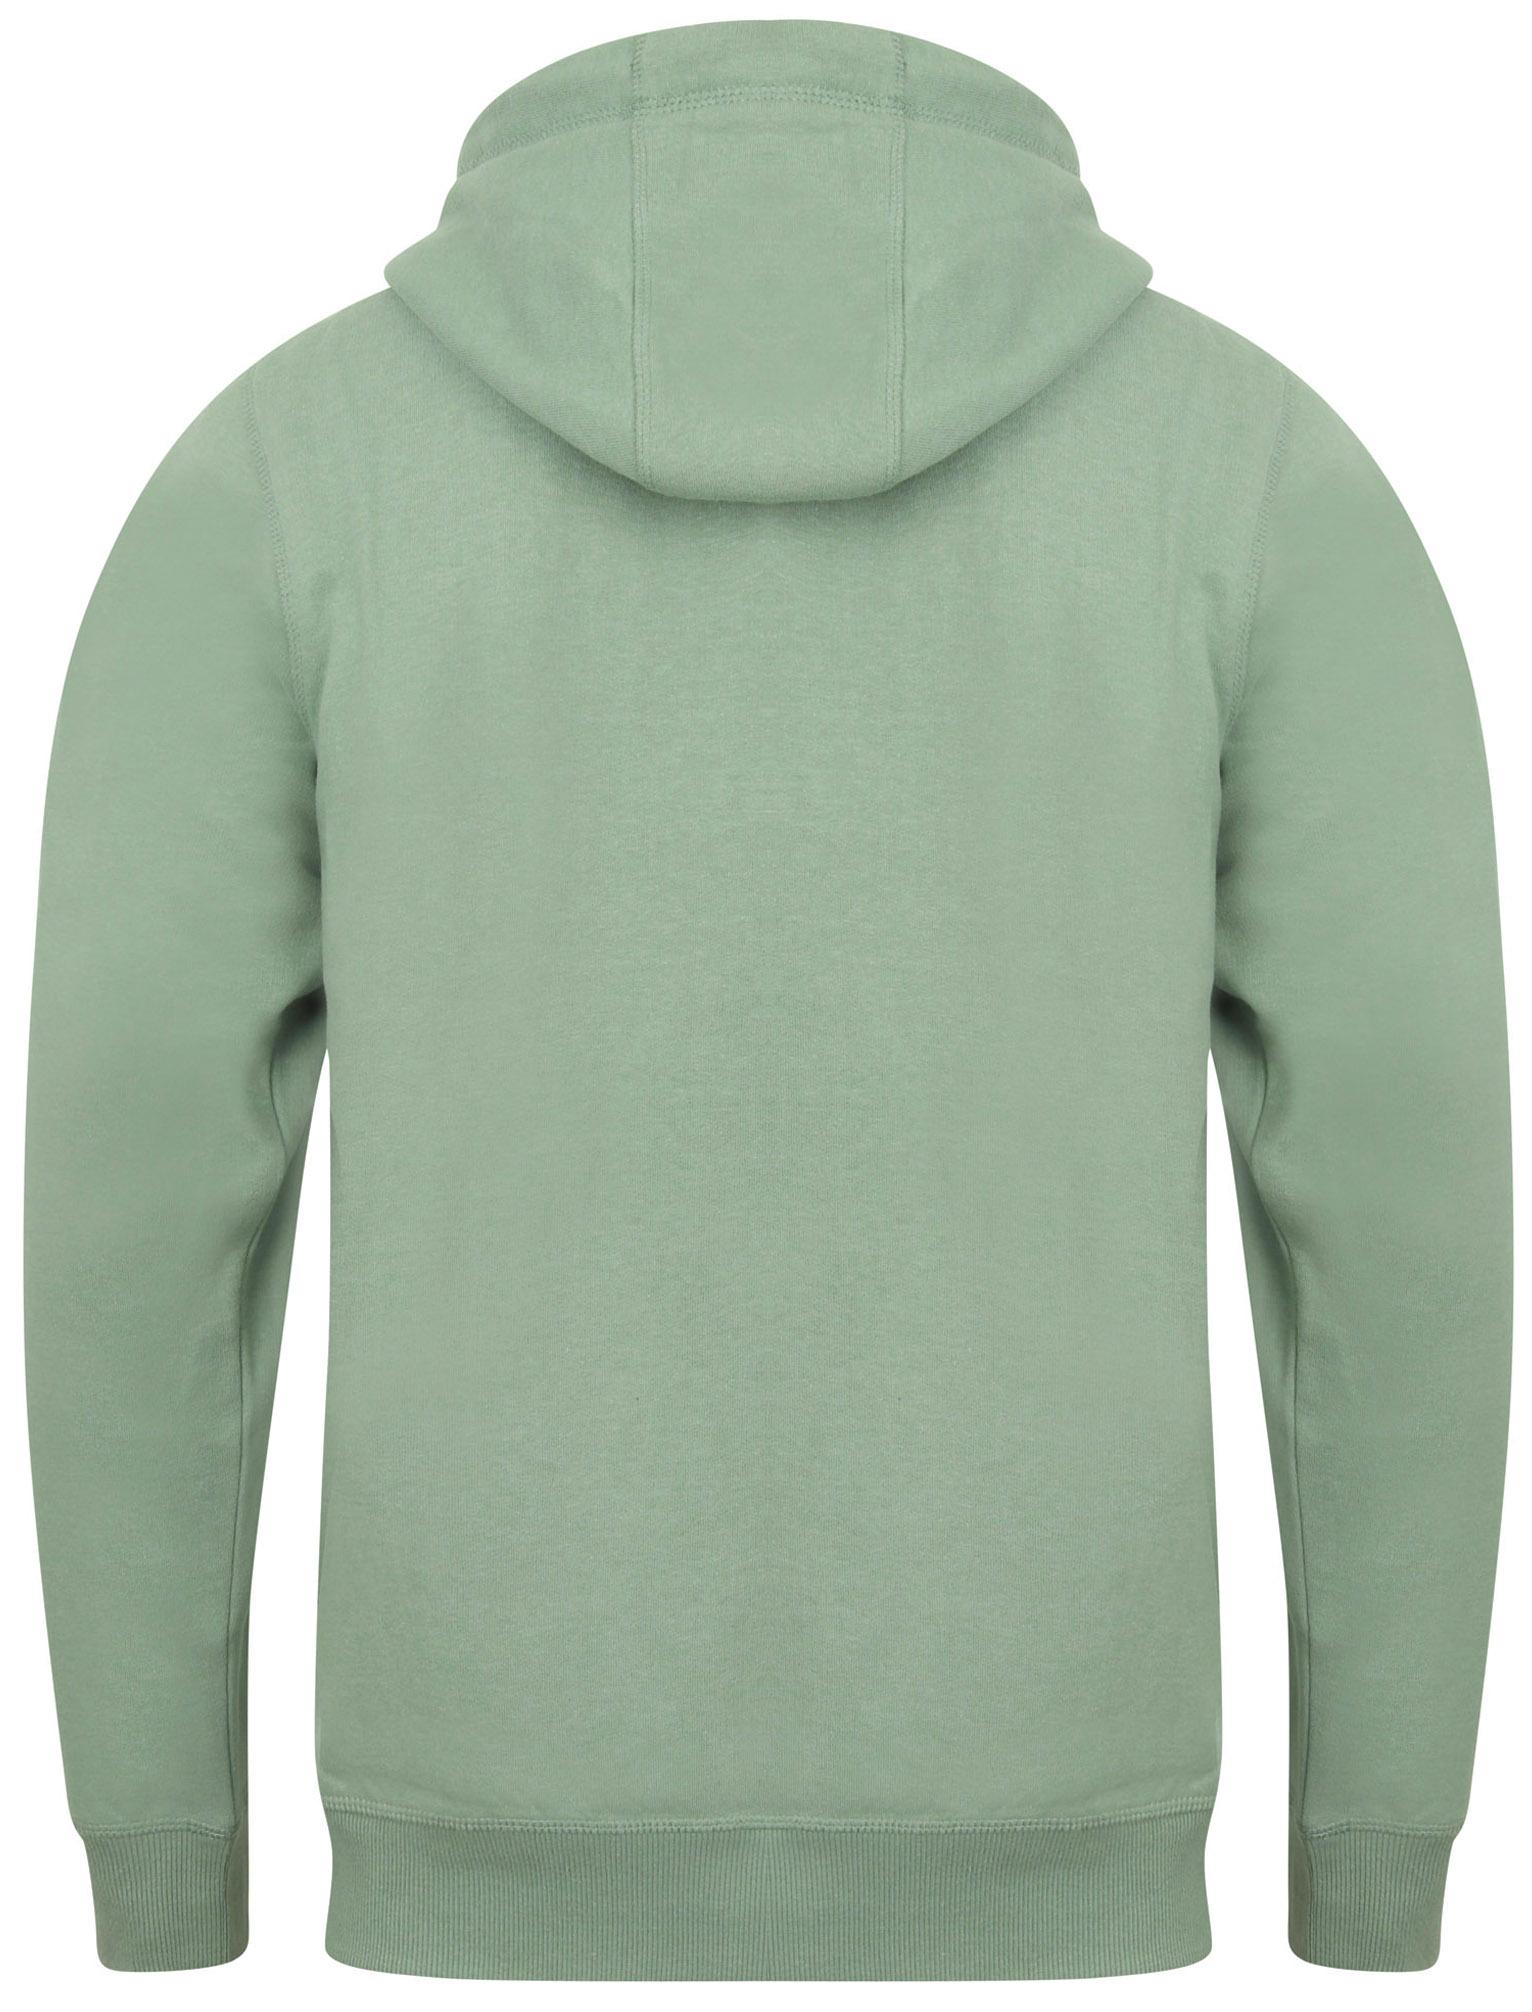 Tokyo-Laundry-Men-039-s-Harper-Zip-Up-Hoodie-Hooded-Top-Sweatshirt-Sweater-Jacket thumbnail 11